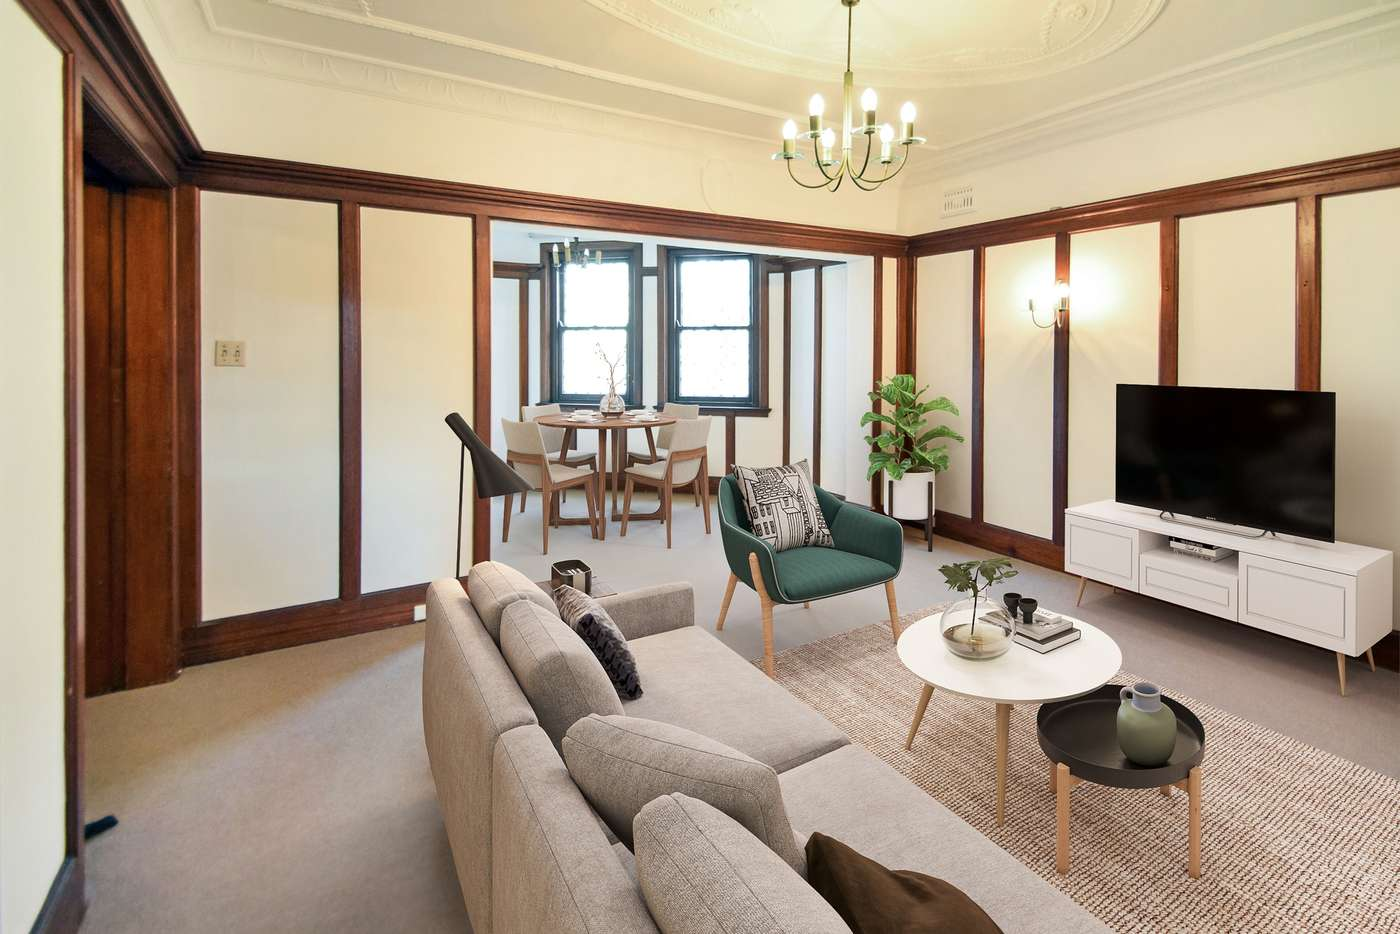 Main view of Homely apartment listing, 4/72 Elizabeth Bay Road, Elizabeth Bay NSW 2011